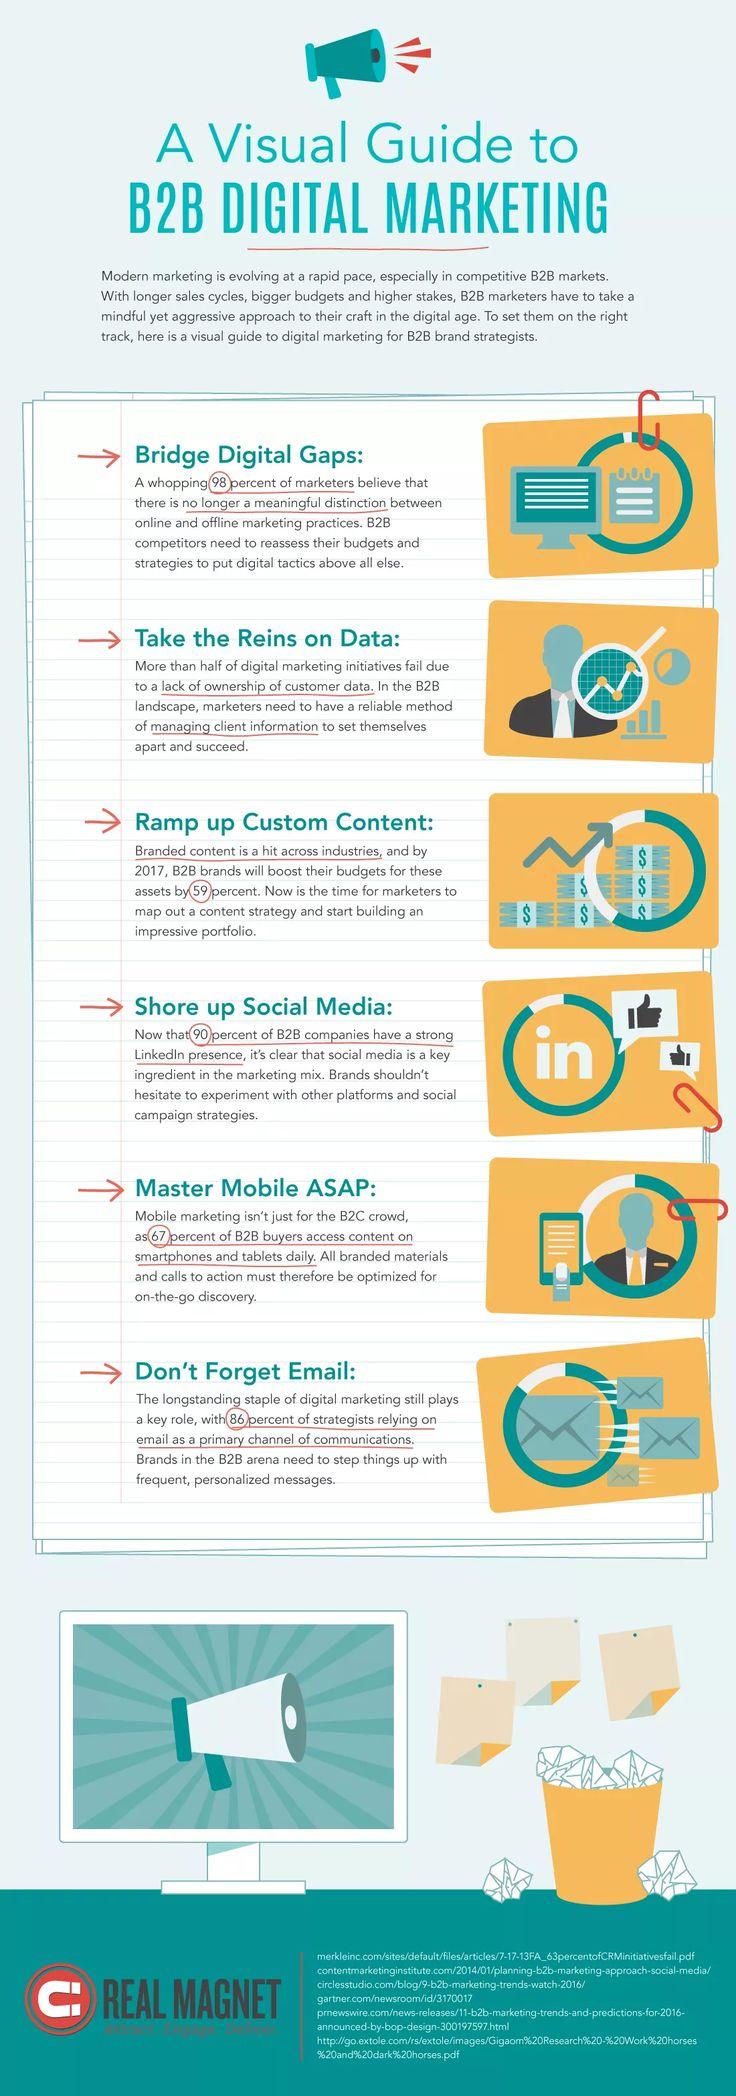 A visual guide to b2b digital marketing infographic